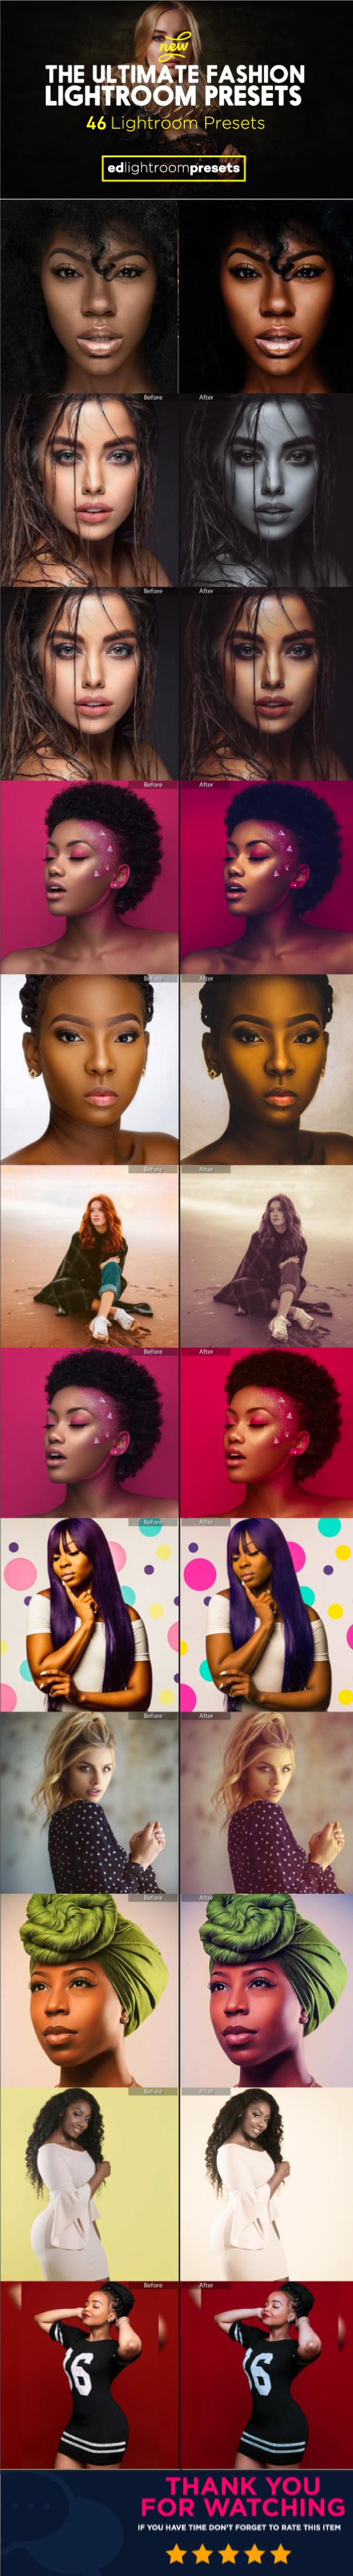 The Ultimate Fashion Magazine Lightroom Presets Collection - Vol 1 - Portrait Lightroom Presets